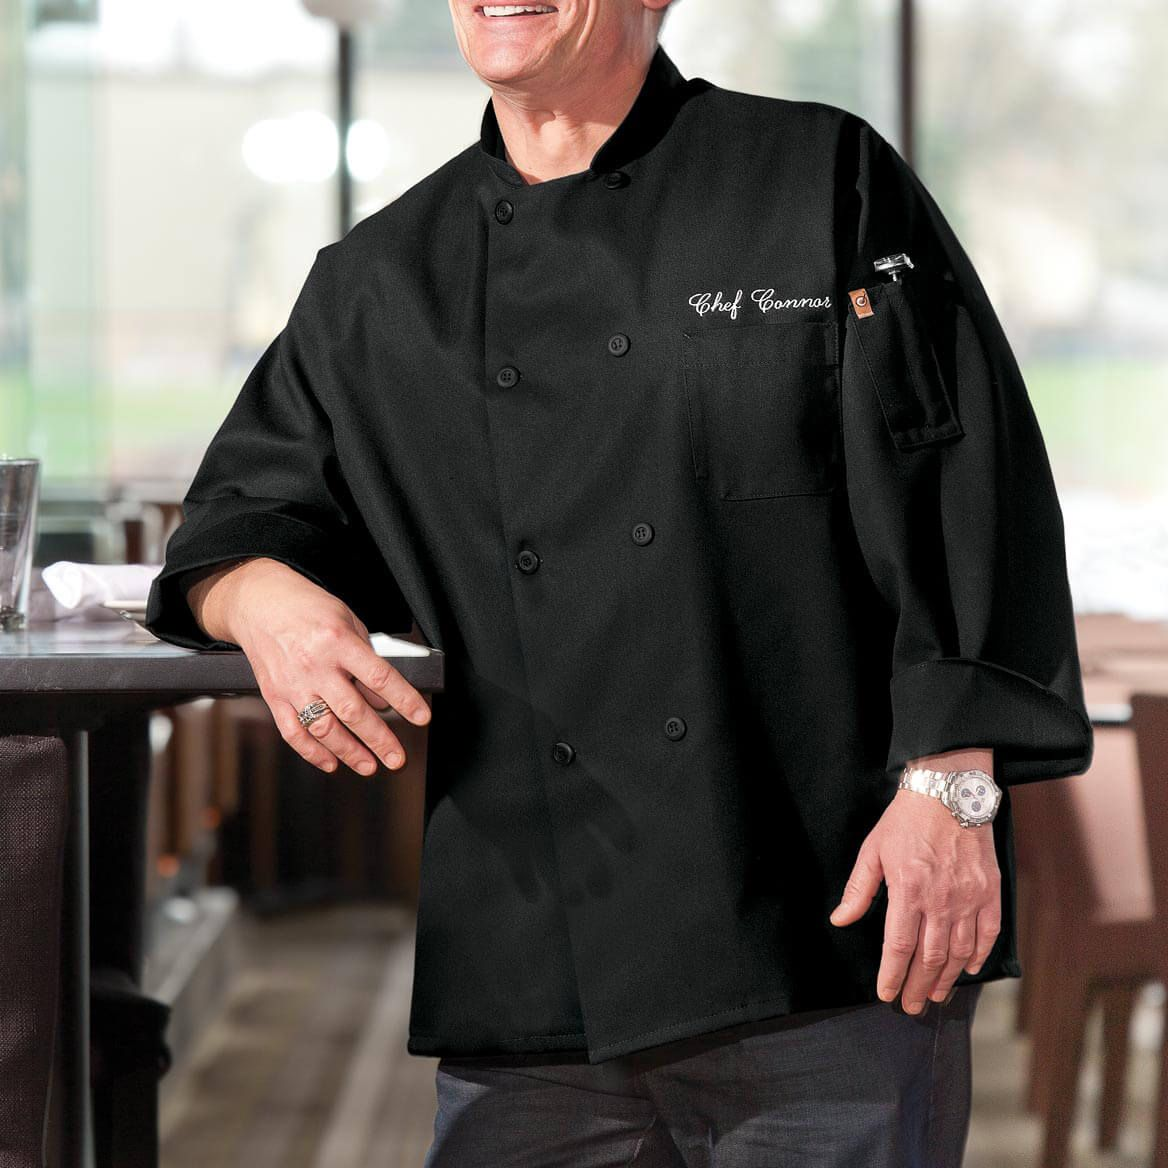 Chefs Jacket Black  Personalized-349541